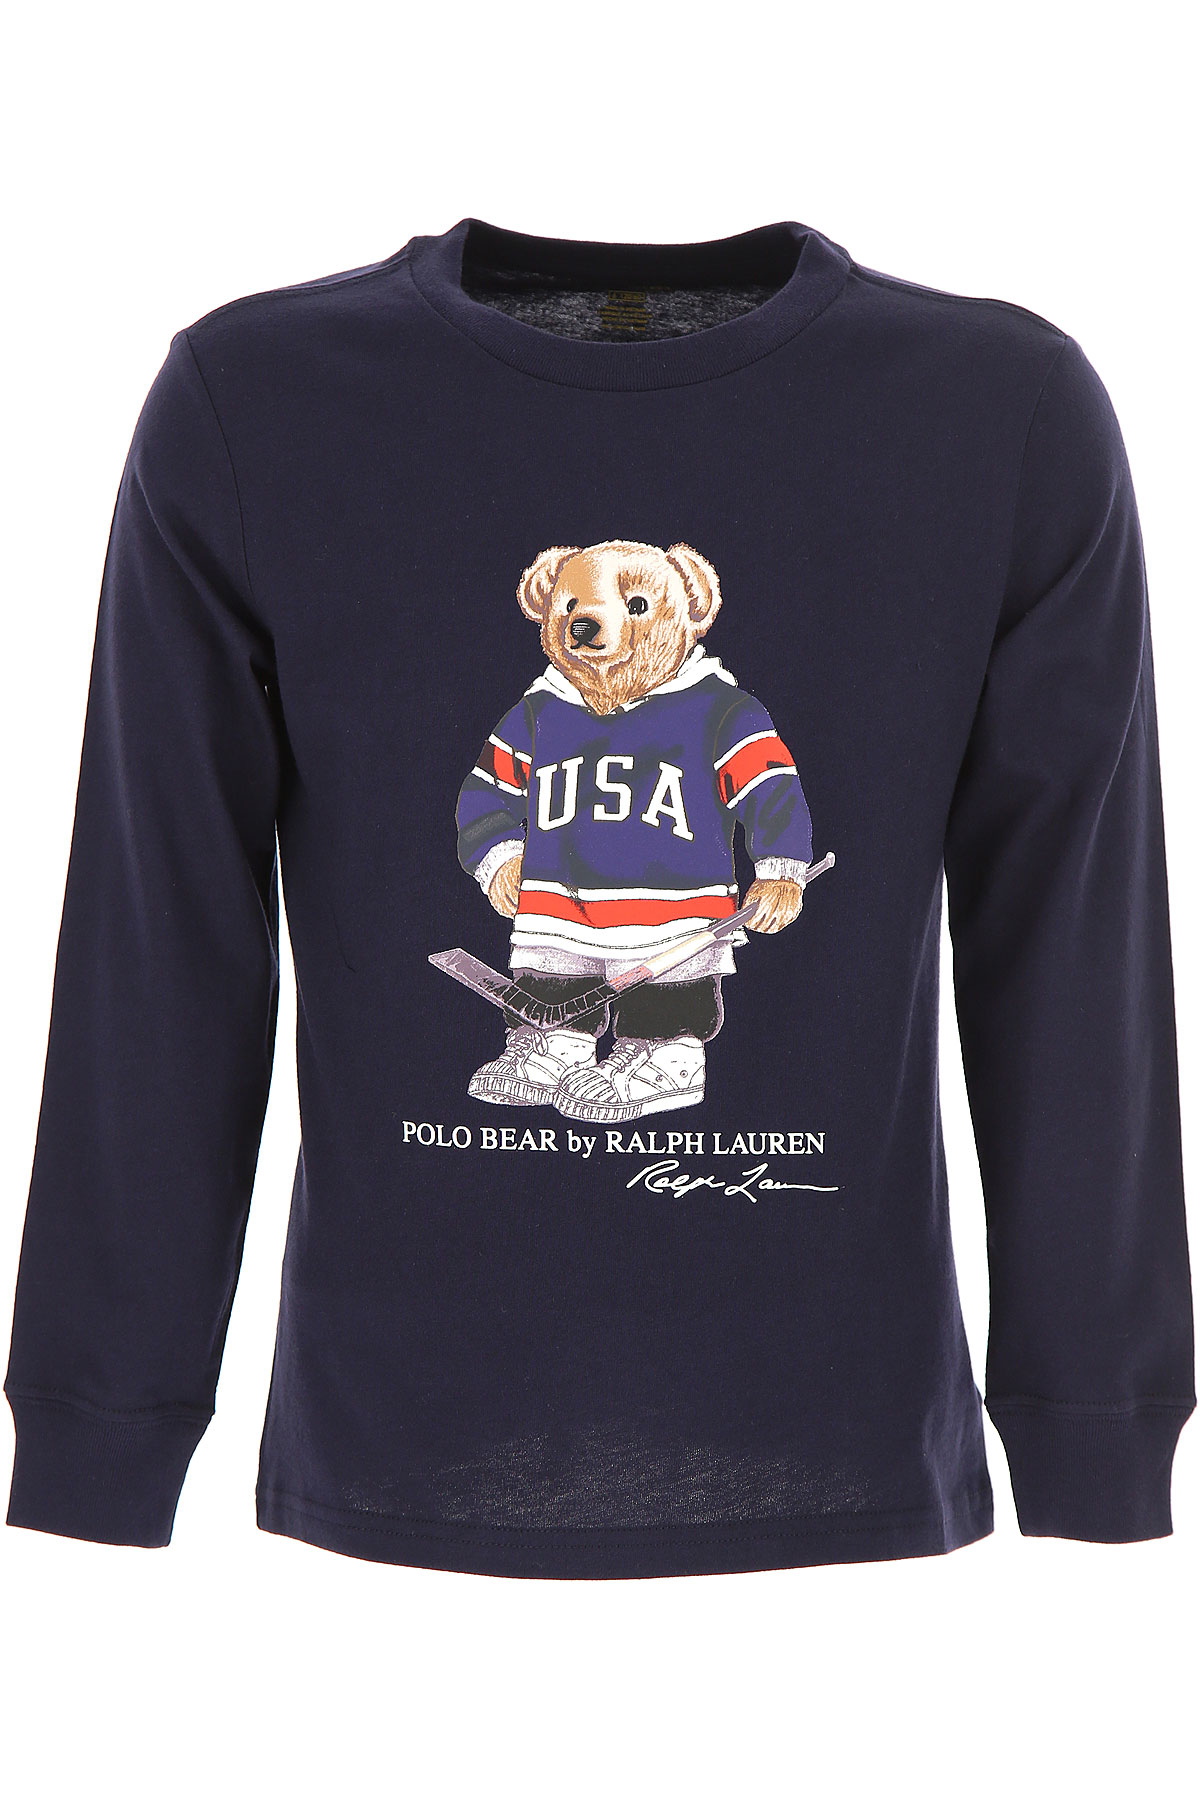 Ralph Lauren Kids T-Shirt for Boys, navy, Cotton, 2017, 2Y 4Y 6Y 7Y USA-484132